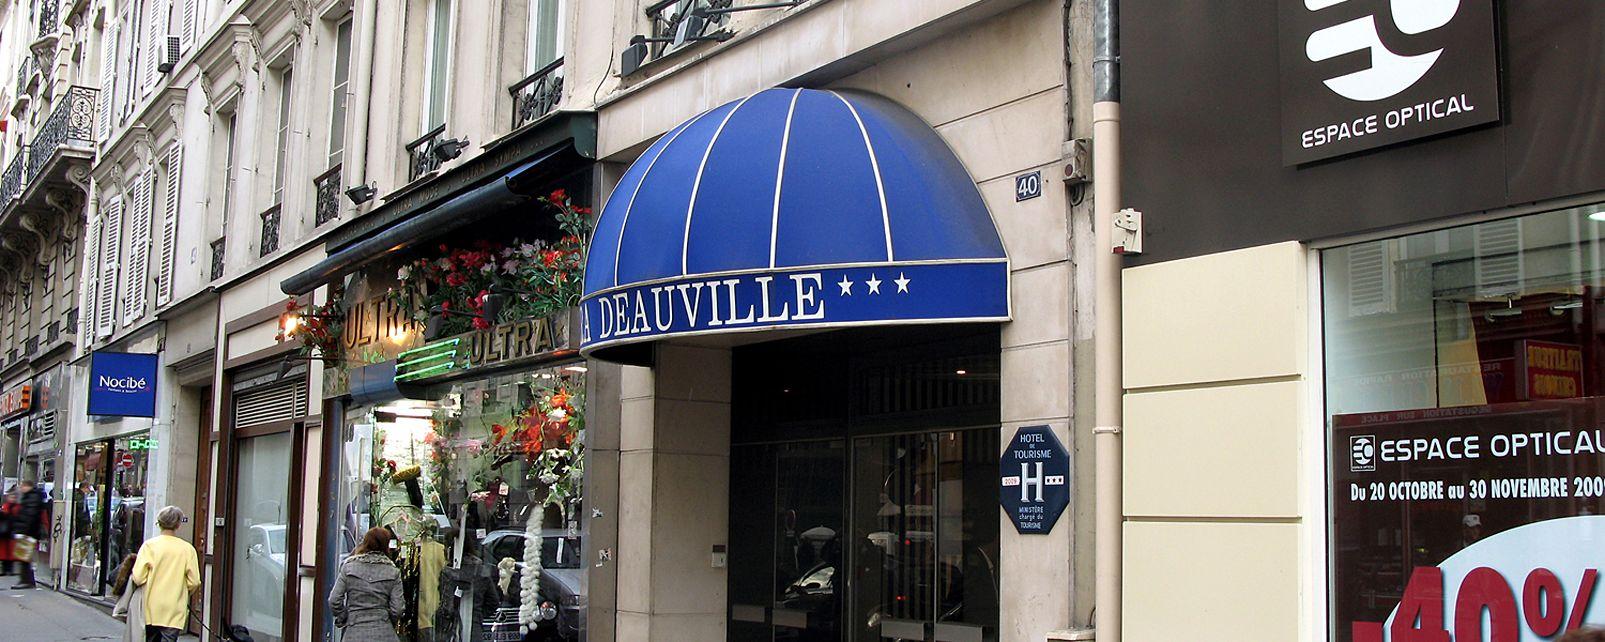 Hotel Opera Deauville